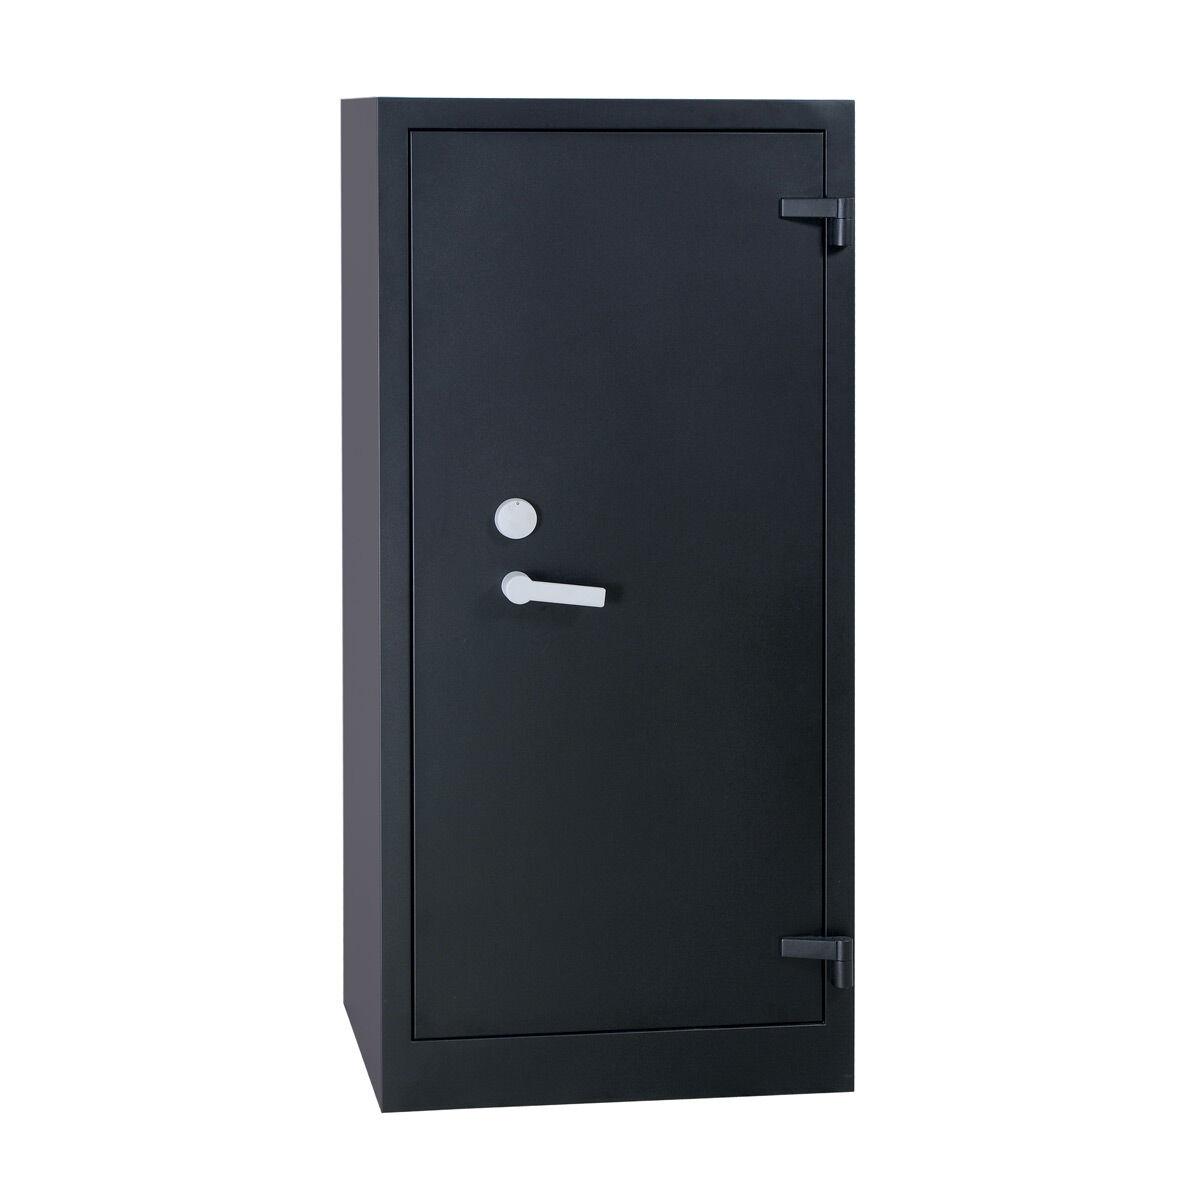 Axess Industries Armoire forte anti-feu   Nbre d'étagères 3   Nbre de portes 1